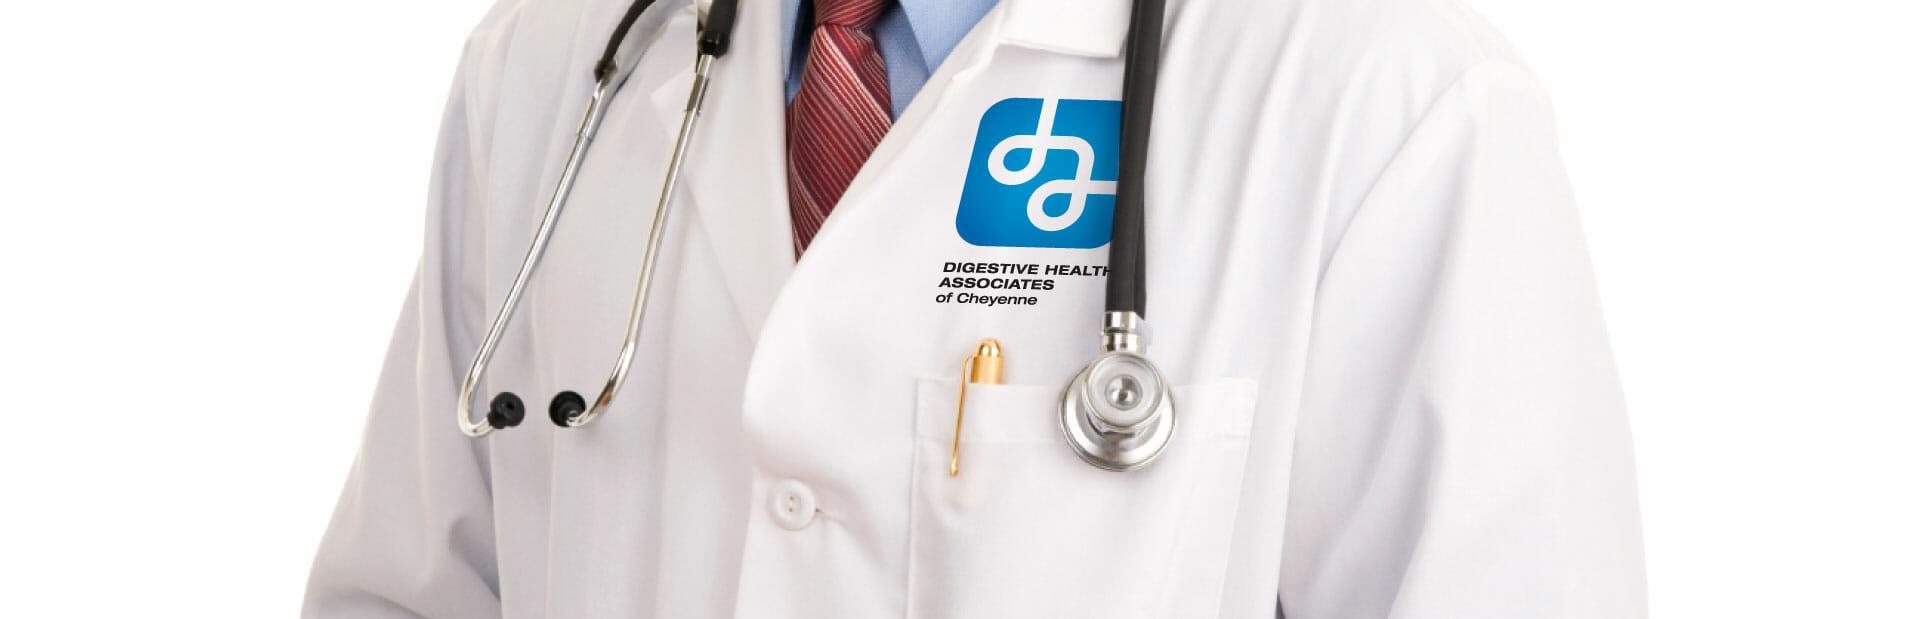 Digestive Health Associates of Cheyenne Physicians